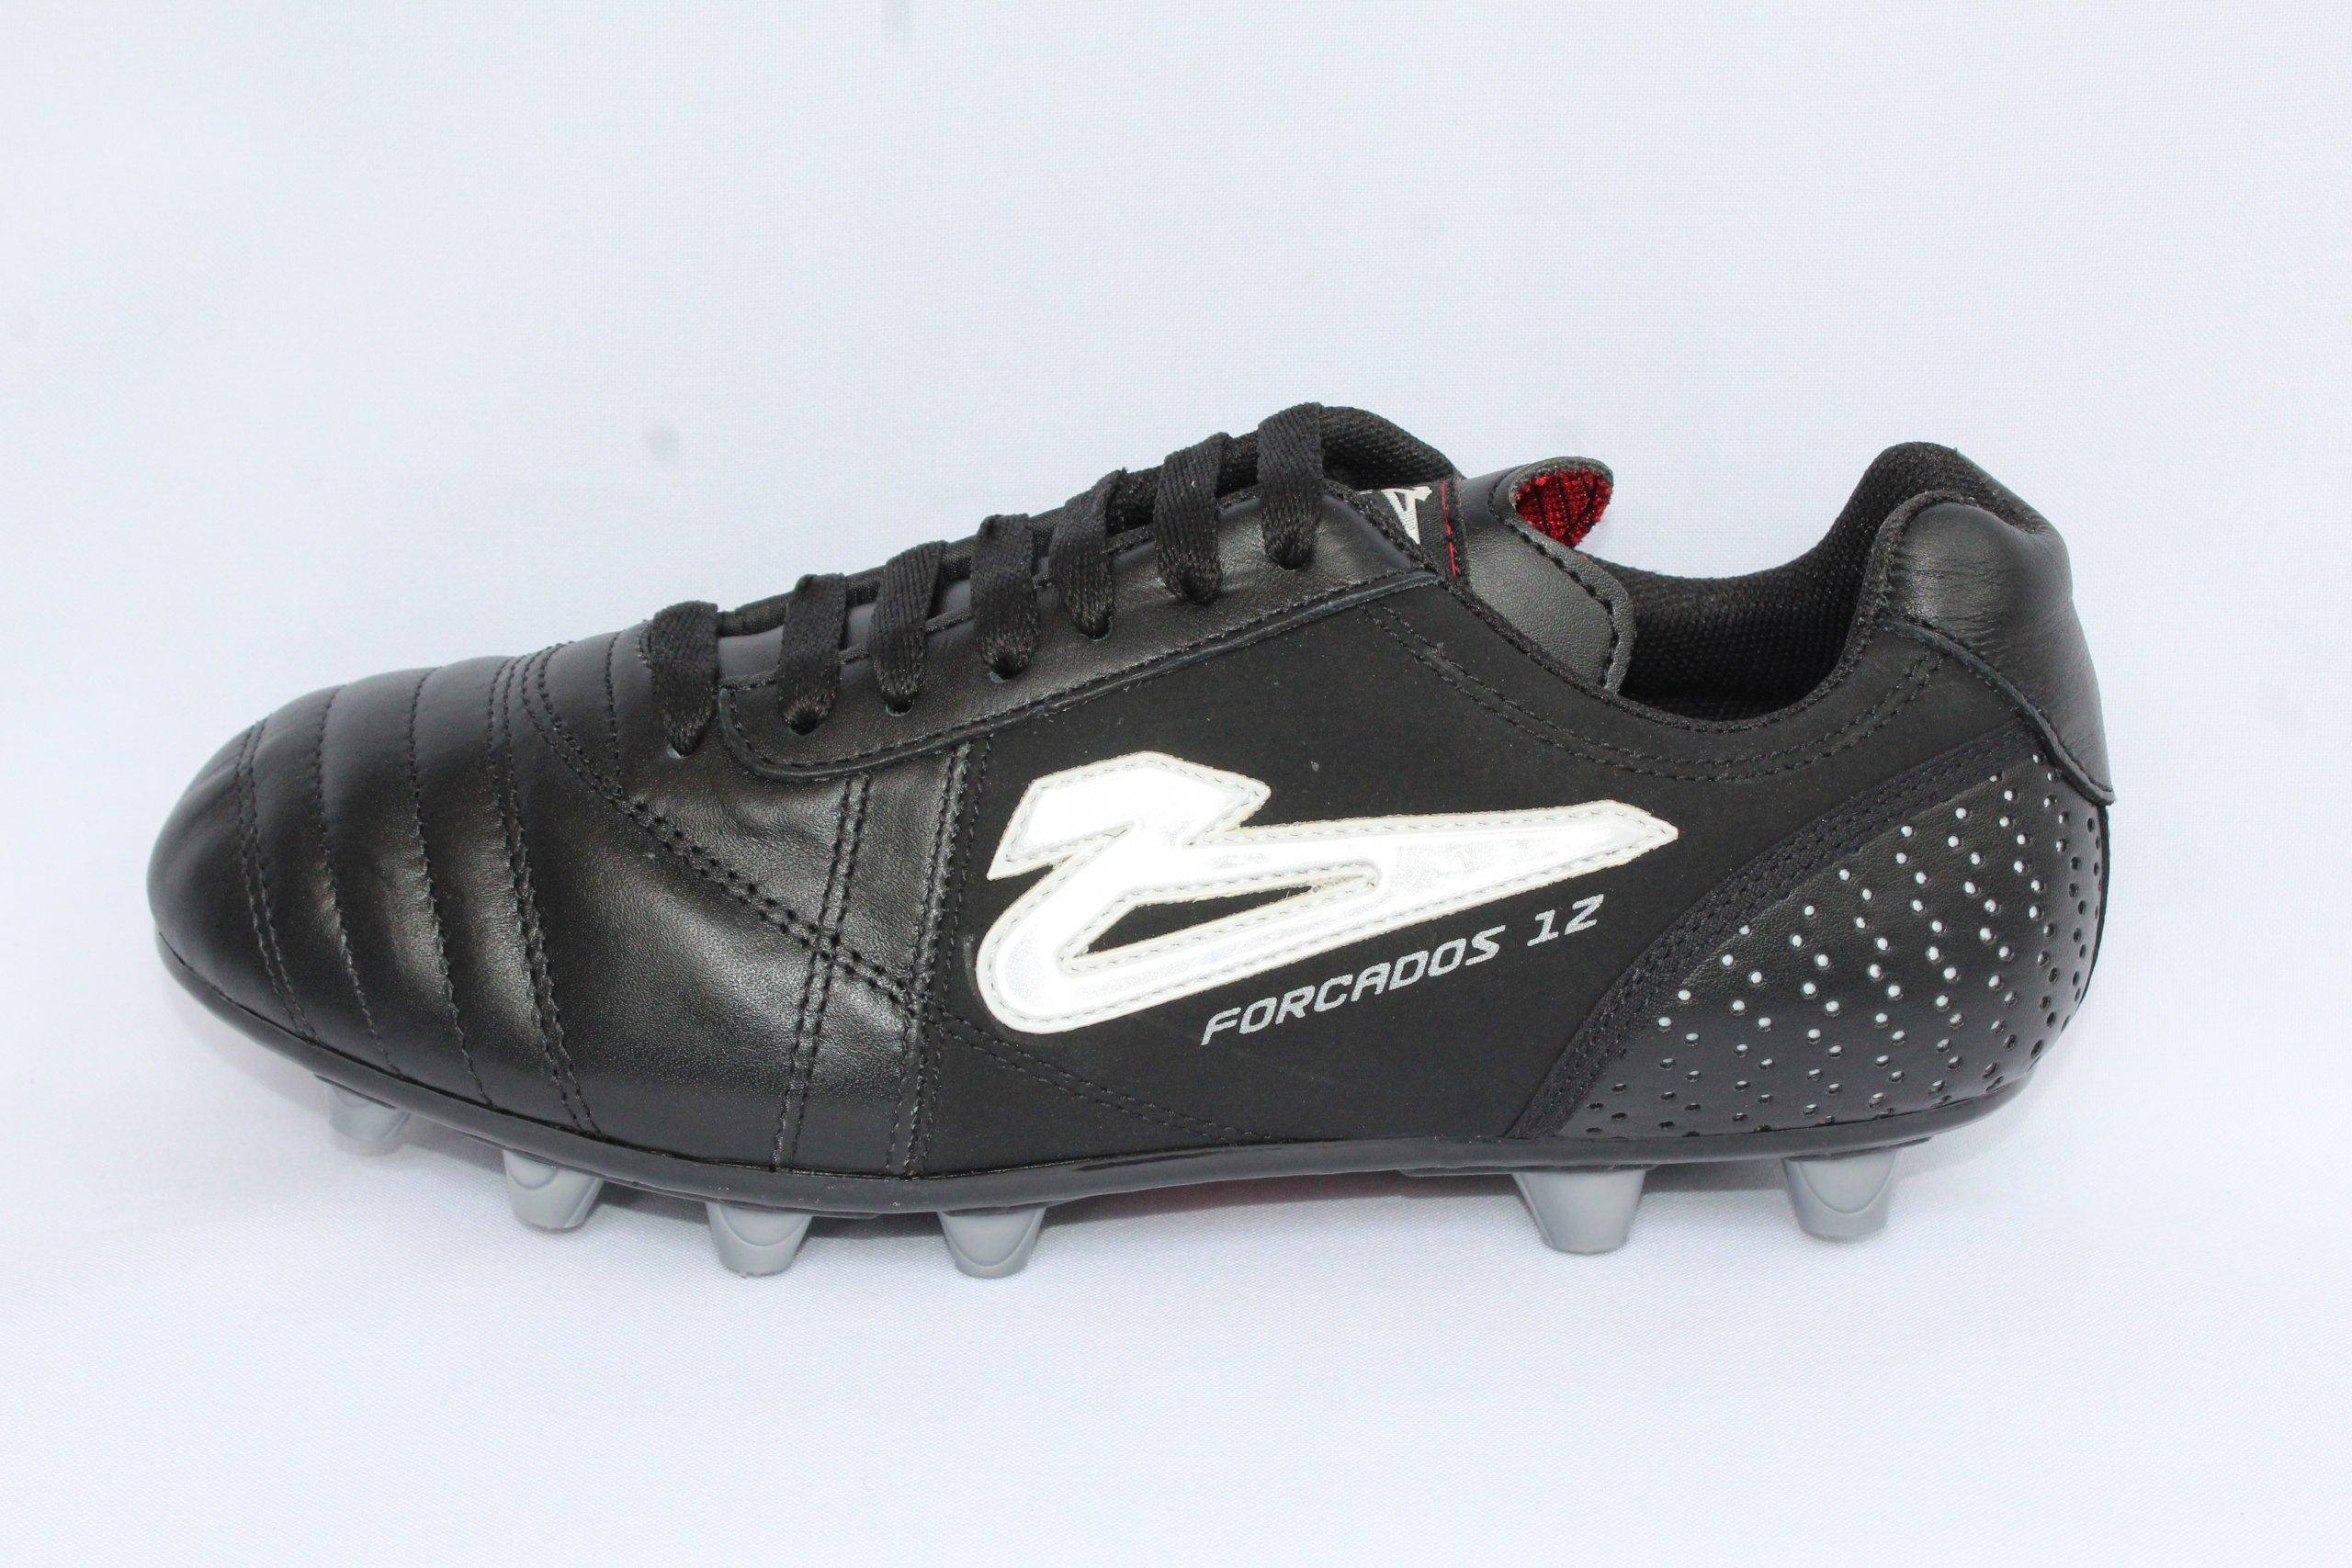 Zapato de fútbol Olmeca mod. Forcados 12 negro